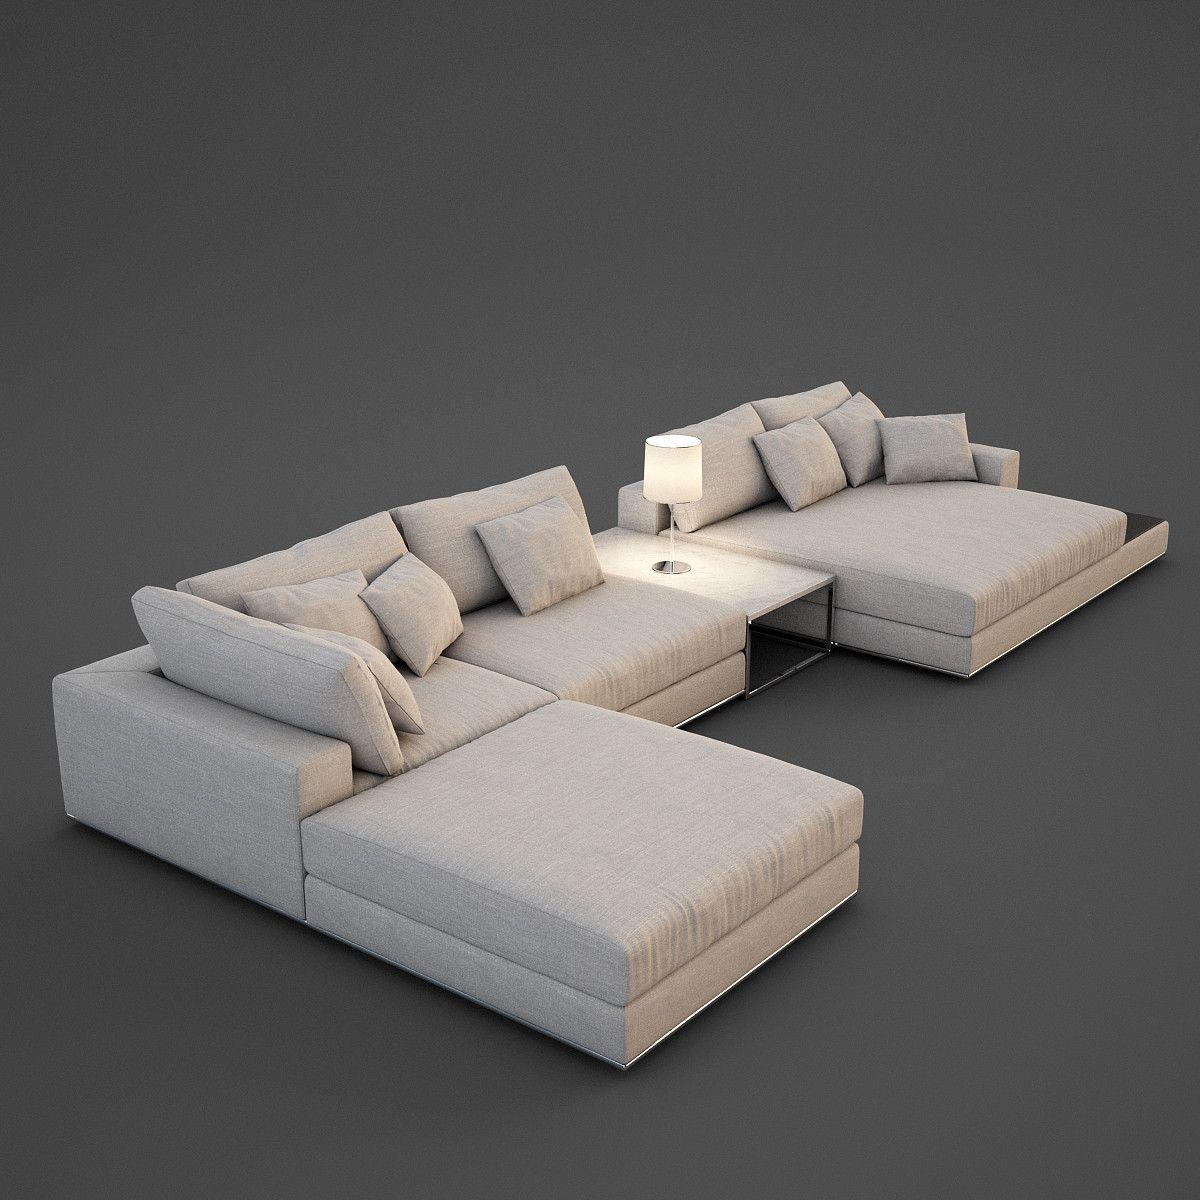 realistic sofa 3d max Modern sofa designs, Living room